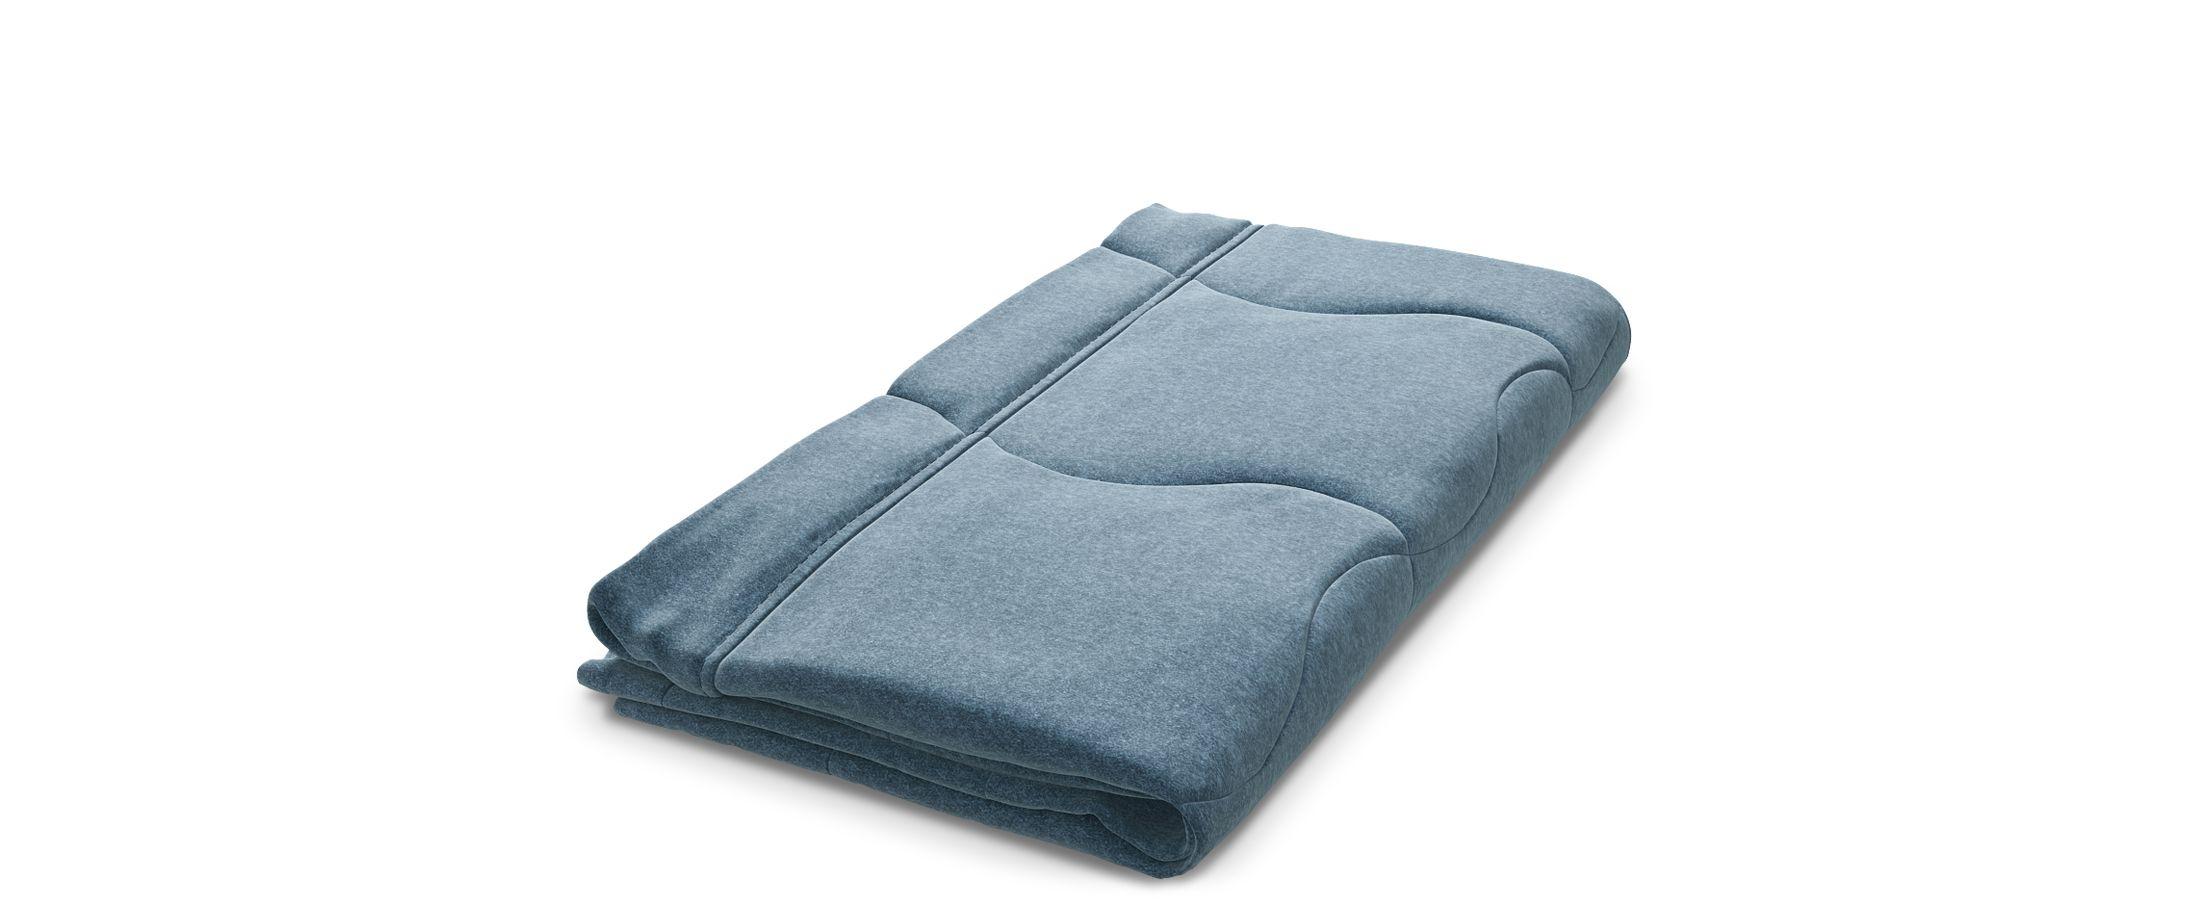 Чехол для дивана Сити 023Размеры 146х107х2 см. Купить синий чехол для дивана в интернет-магазине MOON TRADE.<br><br>Ширина см: 146<br>Глубина см: 107<br>Высота см: 2<br>Материал: Велюр